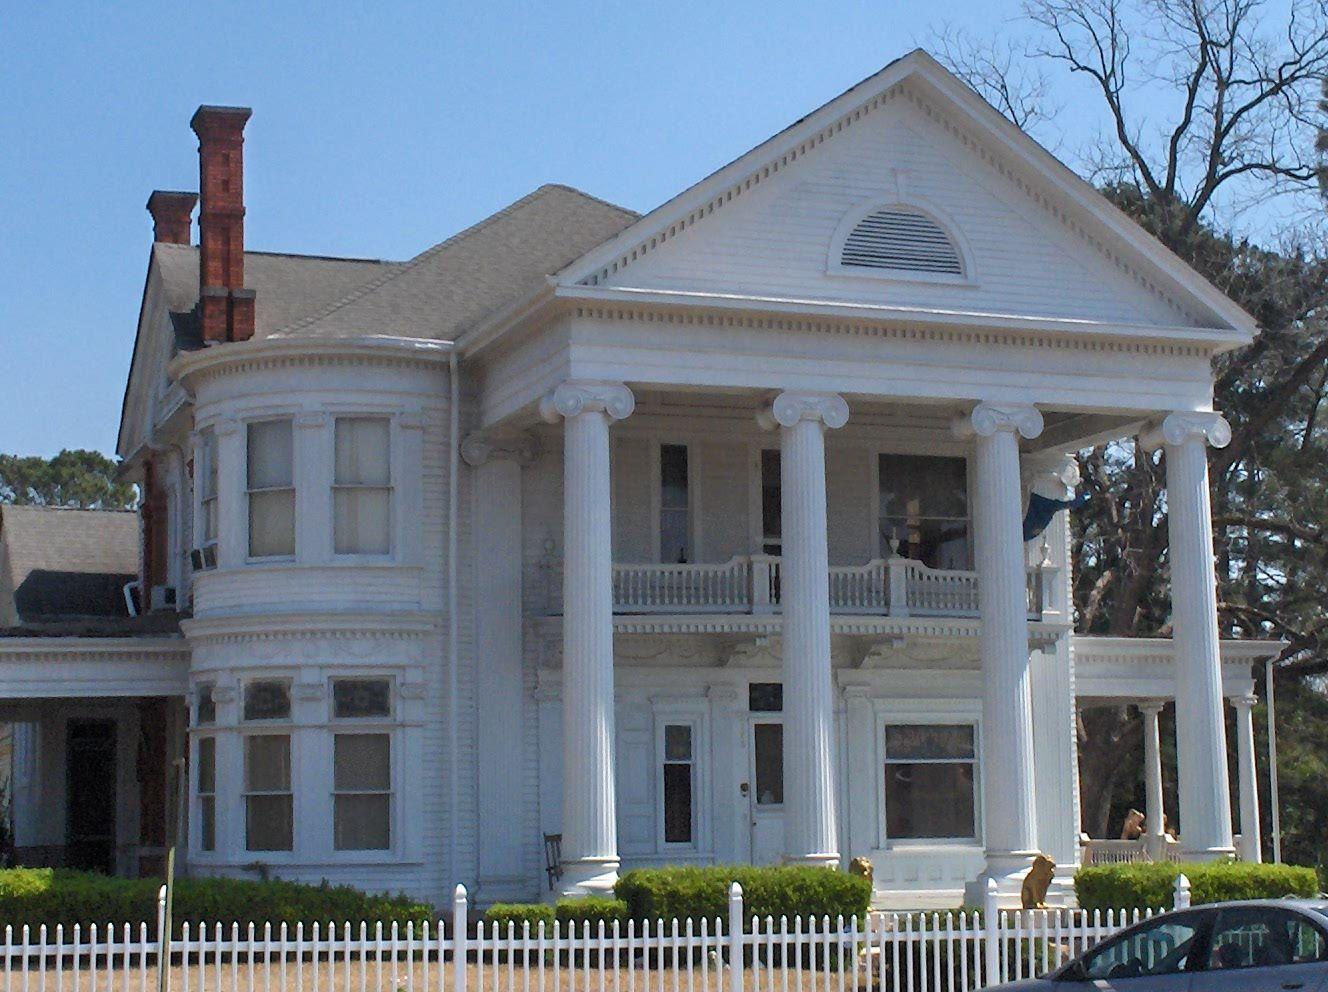 Greek Revival Style Arquitetura